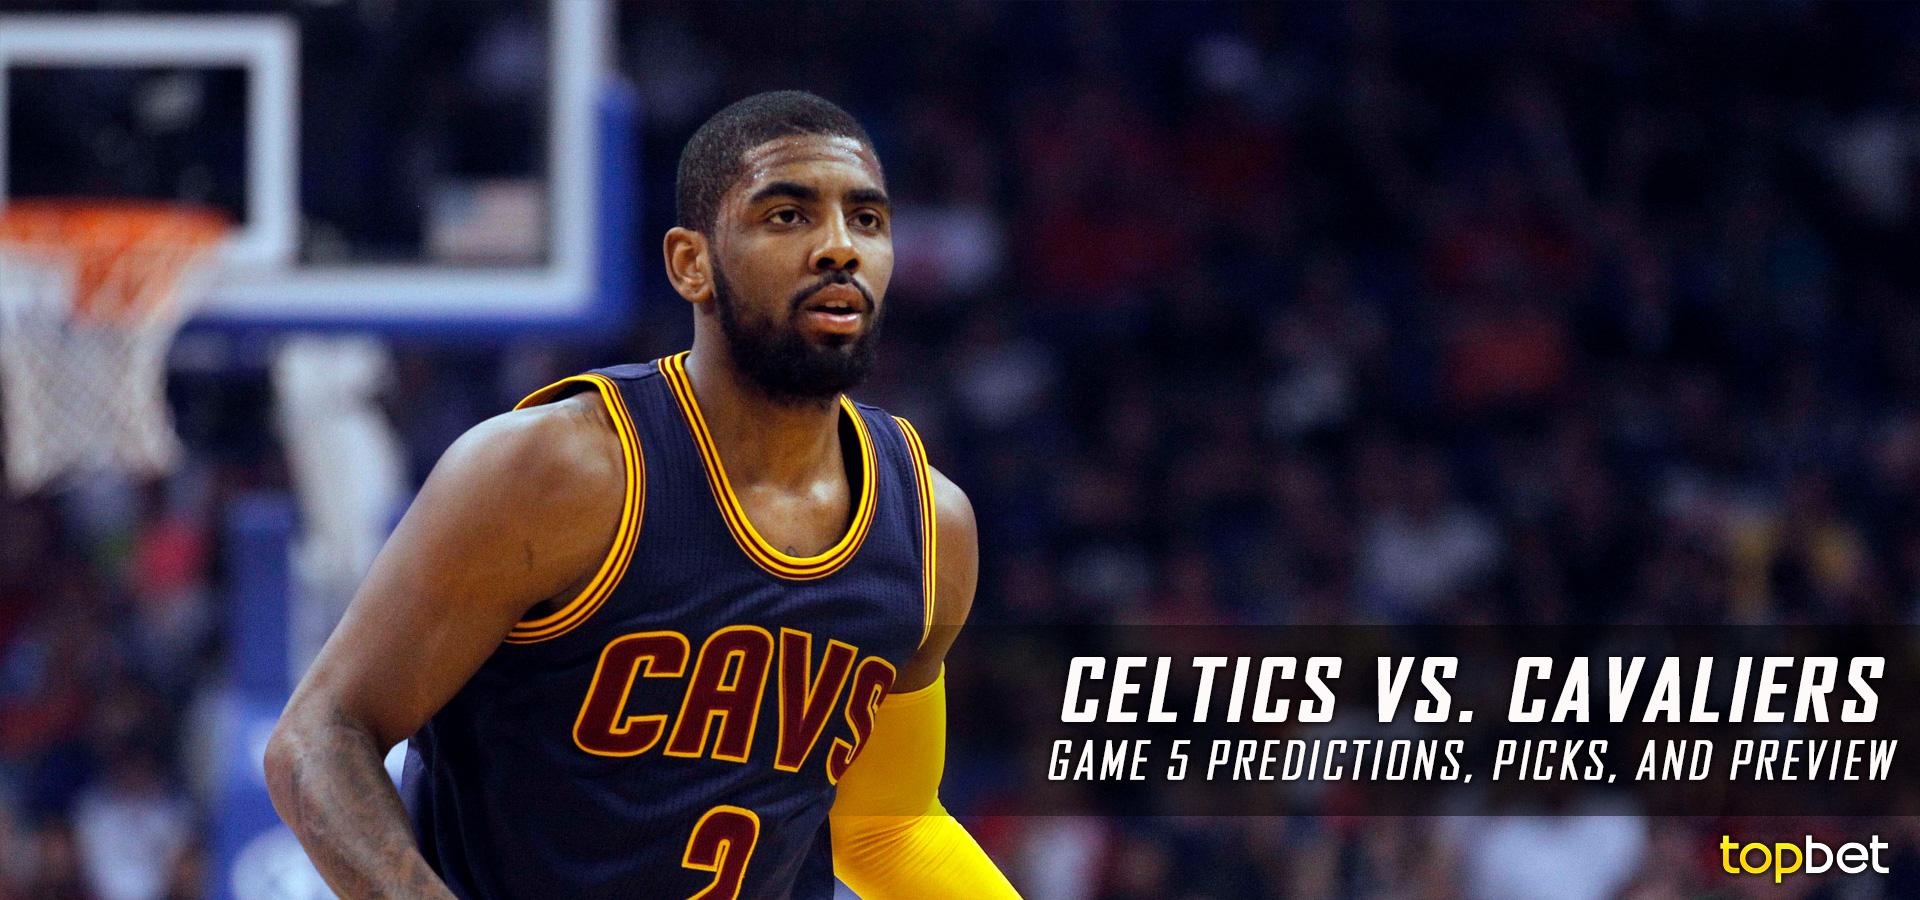 Cavs vs Celtics Series Game 5 Predictions, Picks and Preview